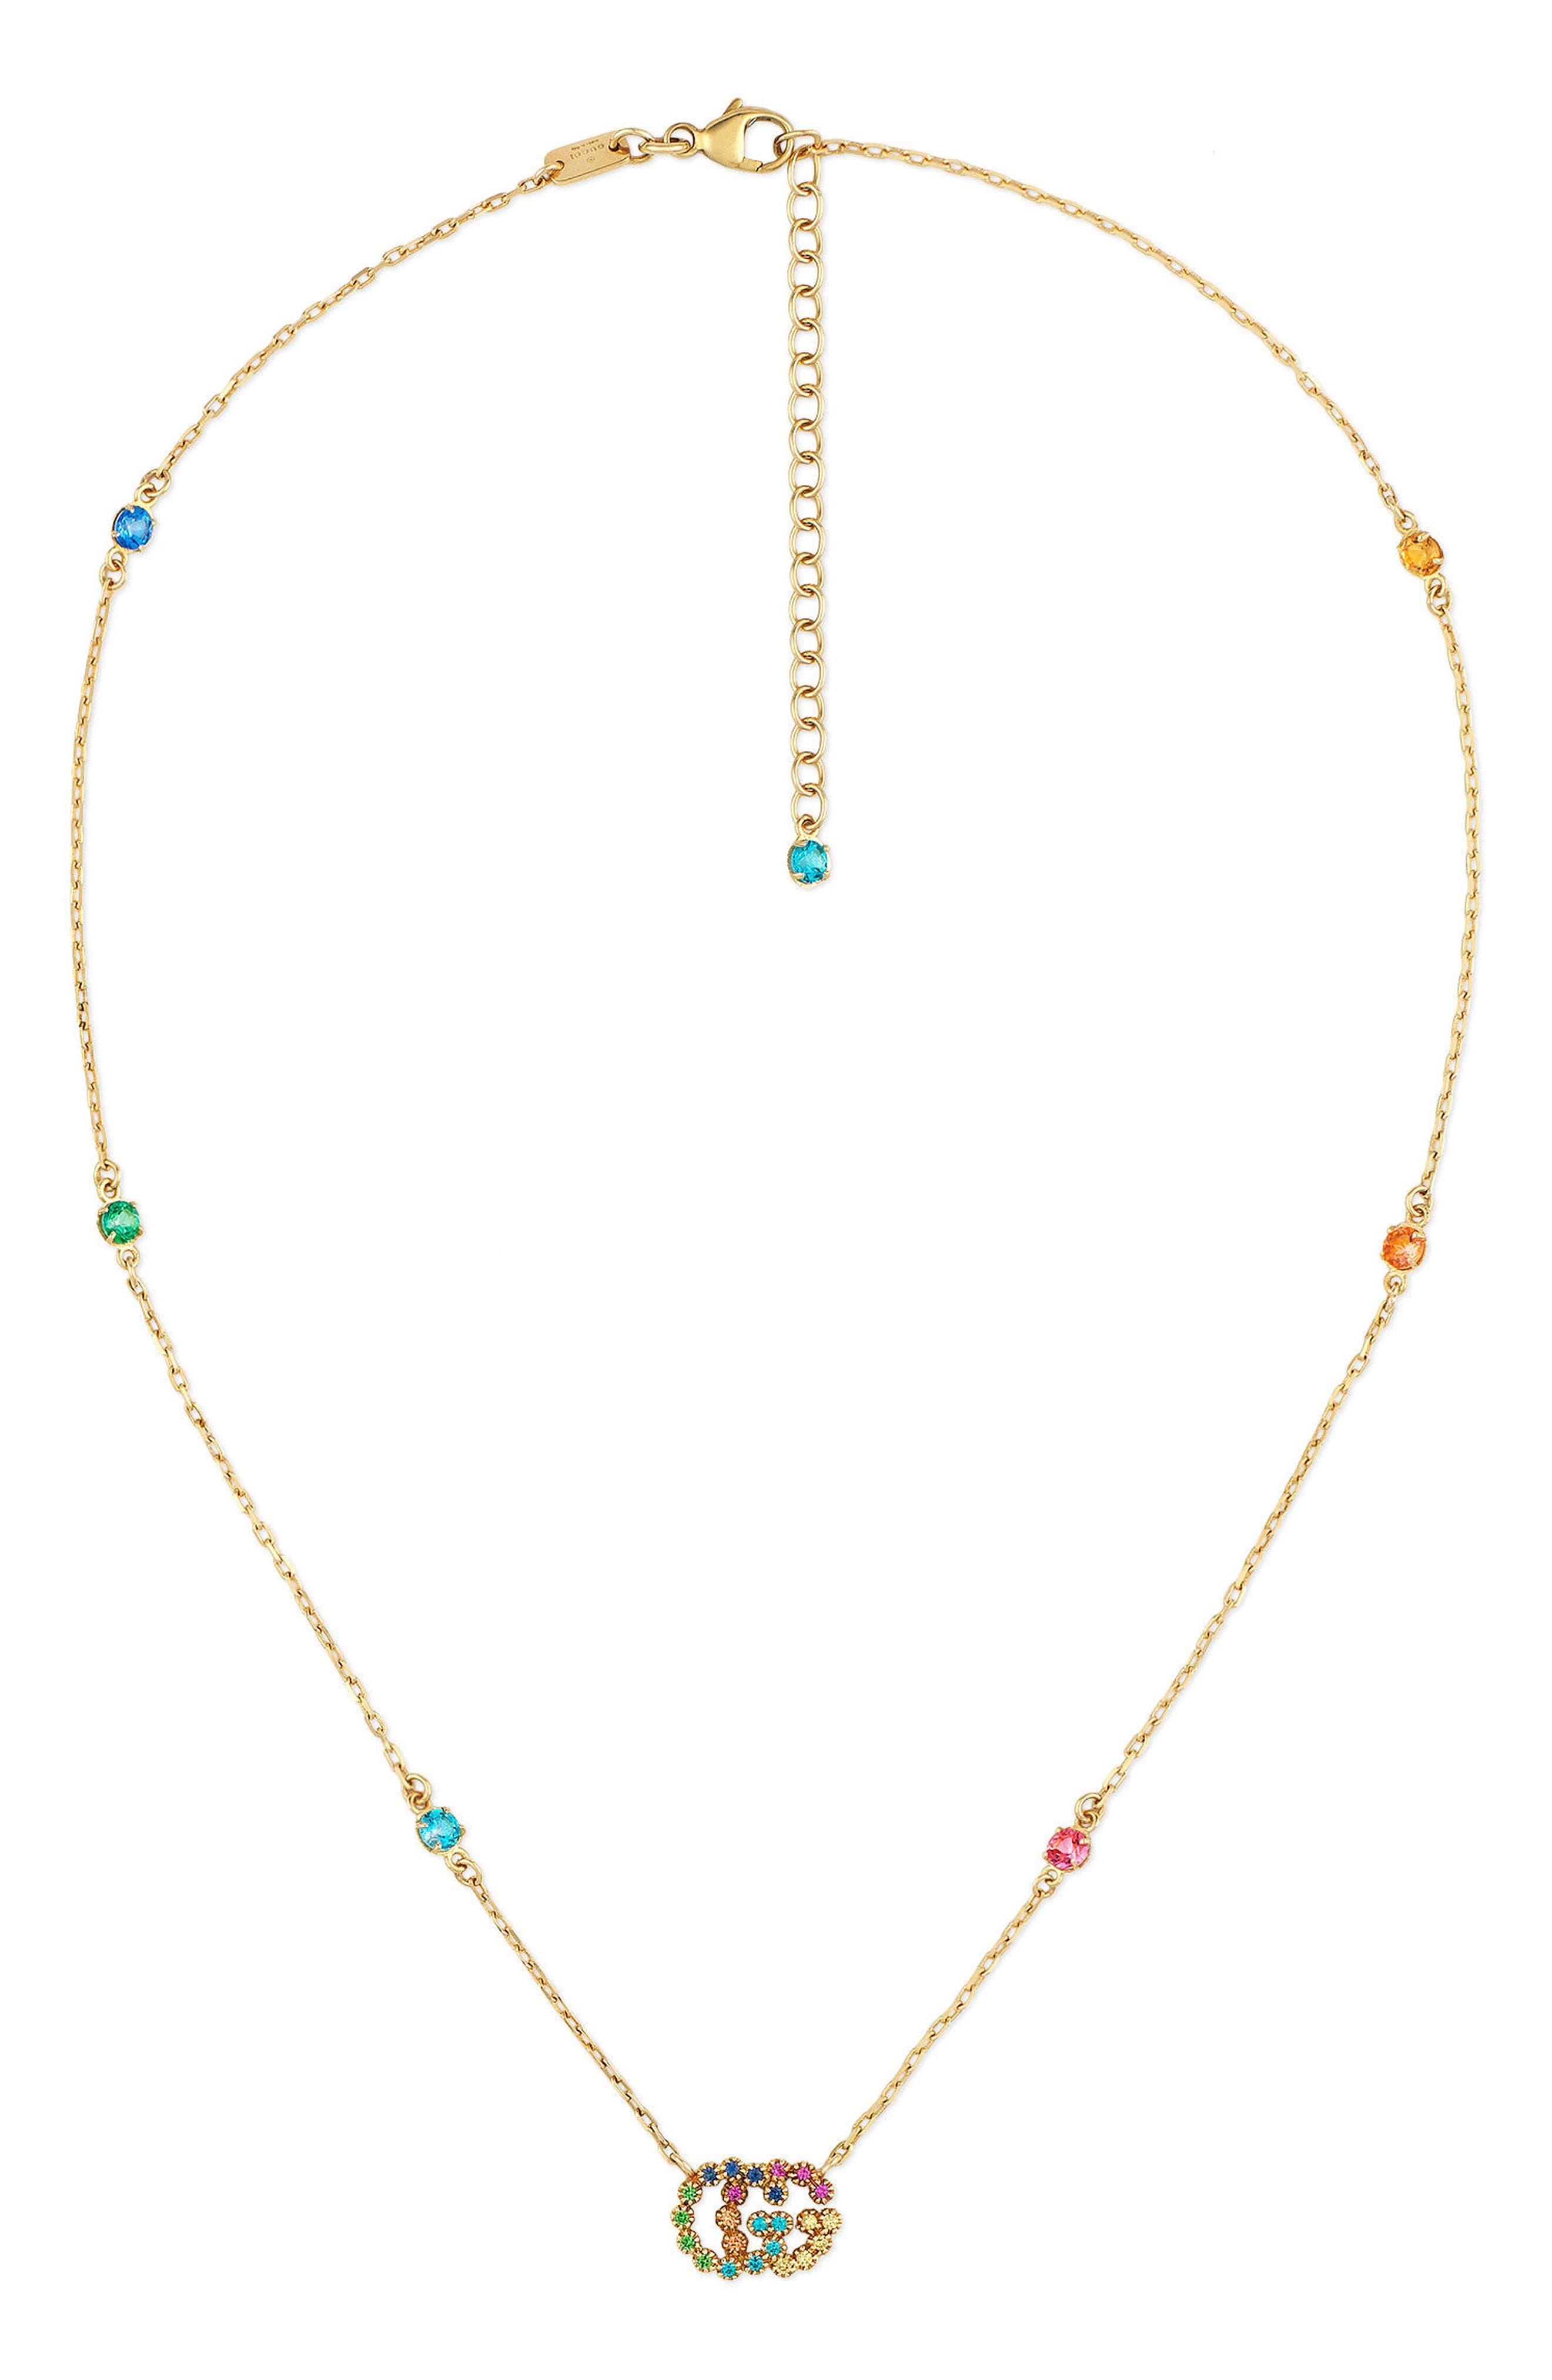 Running G Semiprecius Stone Pendant Necklace,                             Main thumbnail 1, color,                             Yellow Gold